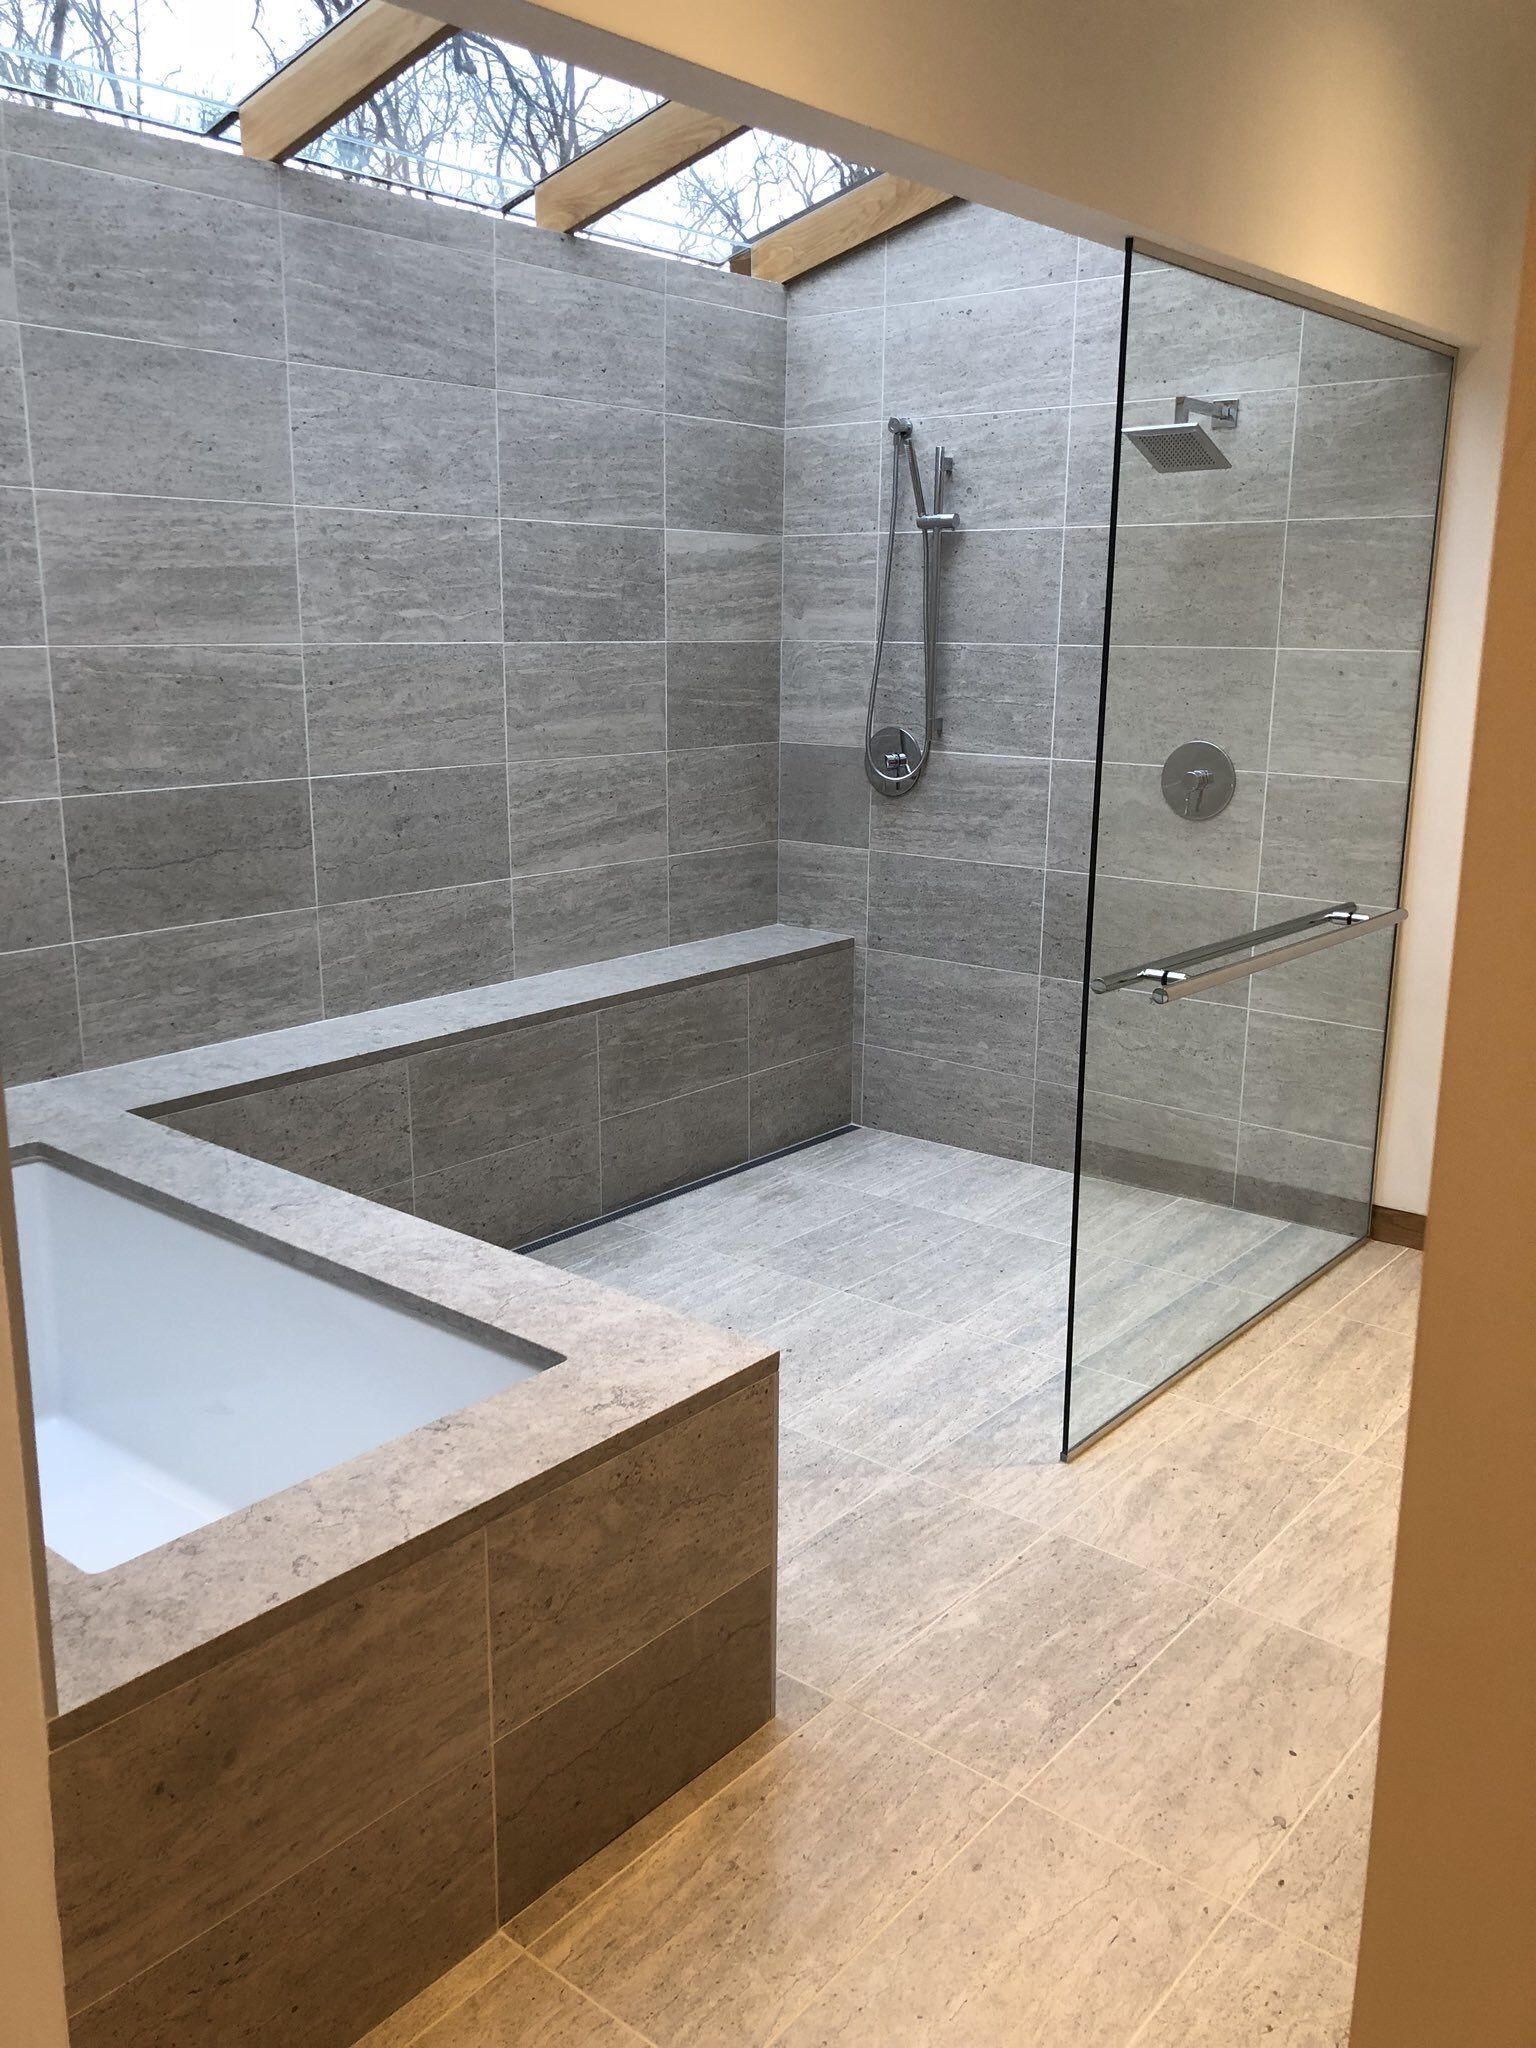 Contemporary Bathroom Design Ideas Every Bathroom Remodel Starts With A Design Concept Master Bathroom Design Contemporary Bathroom Designs Bathroom Interior